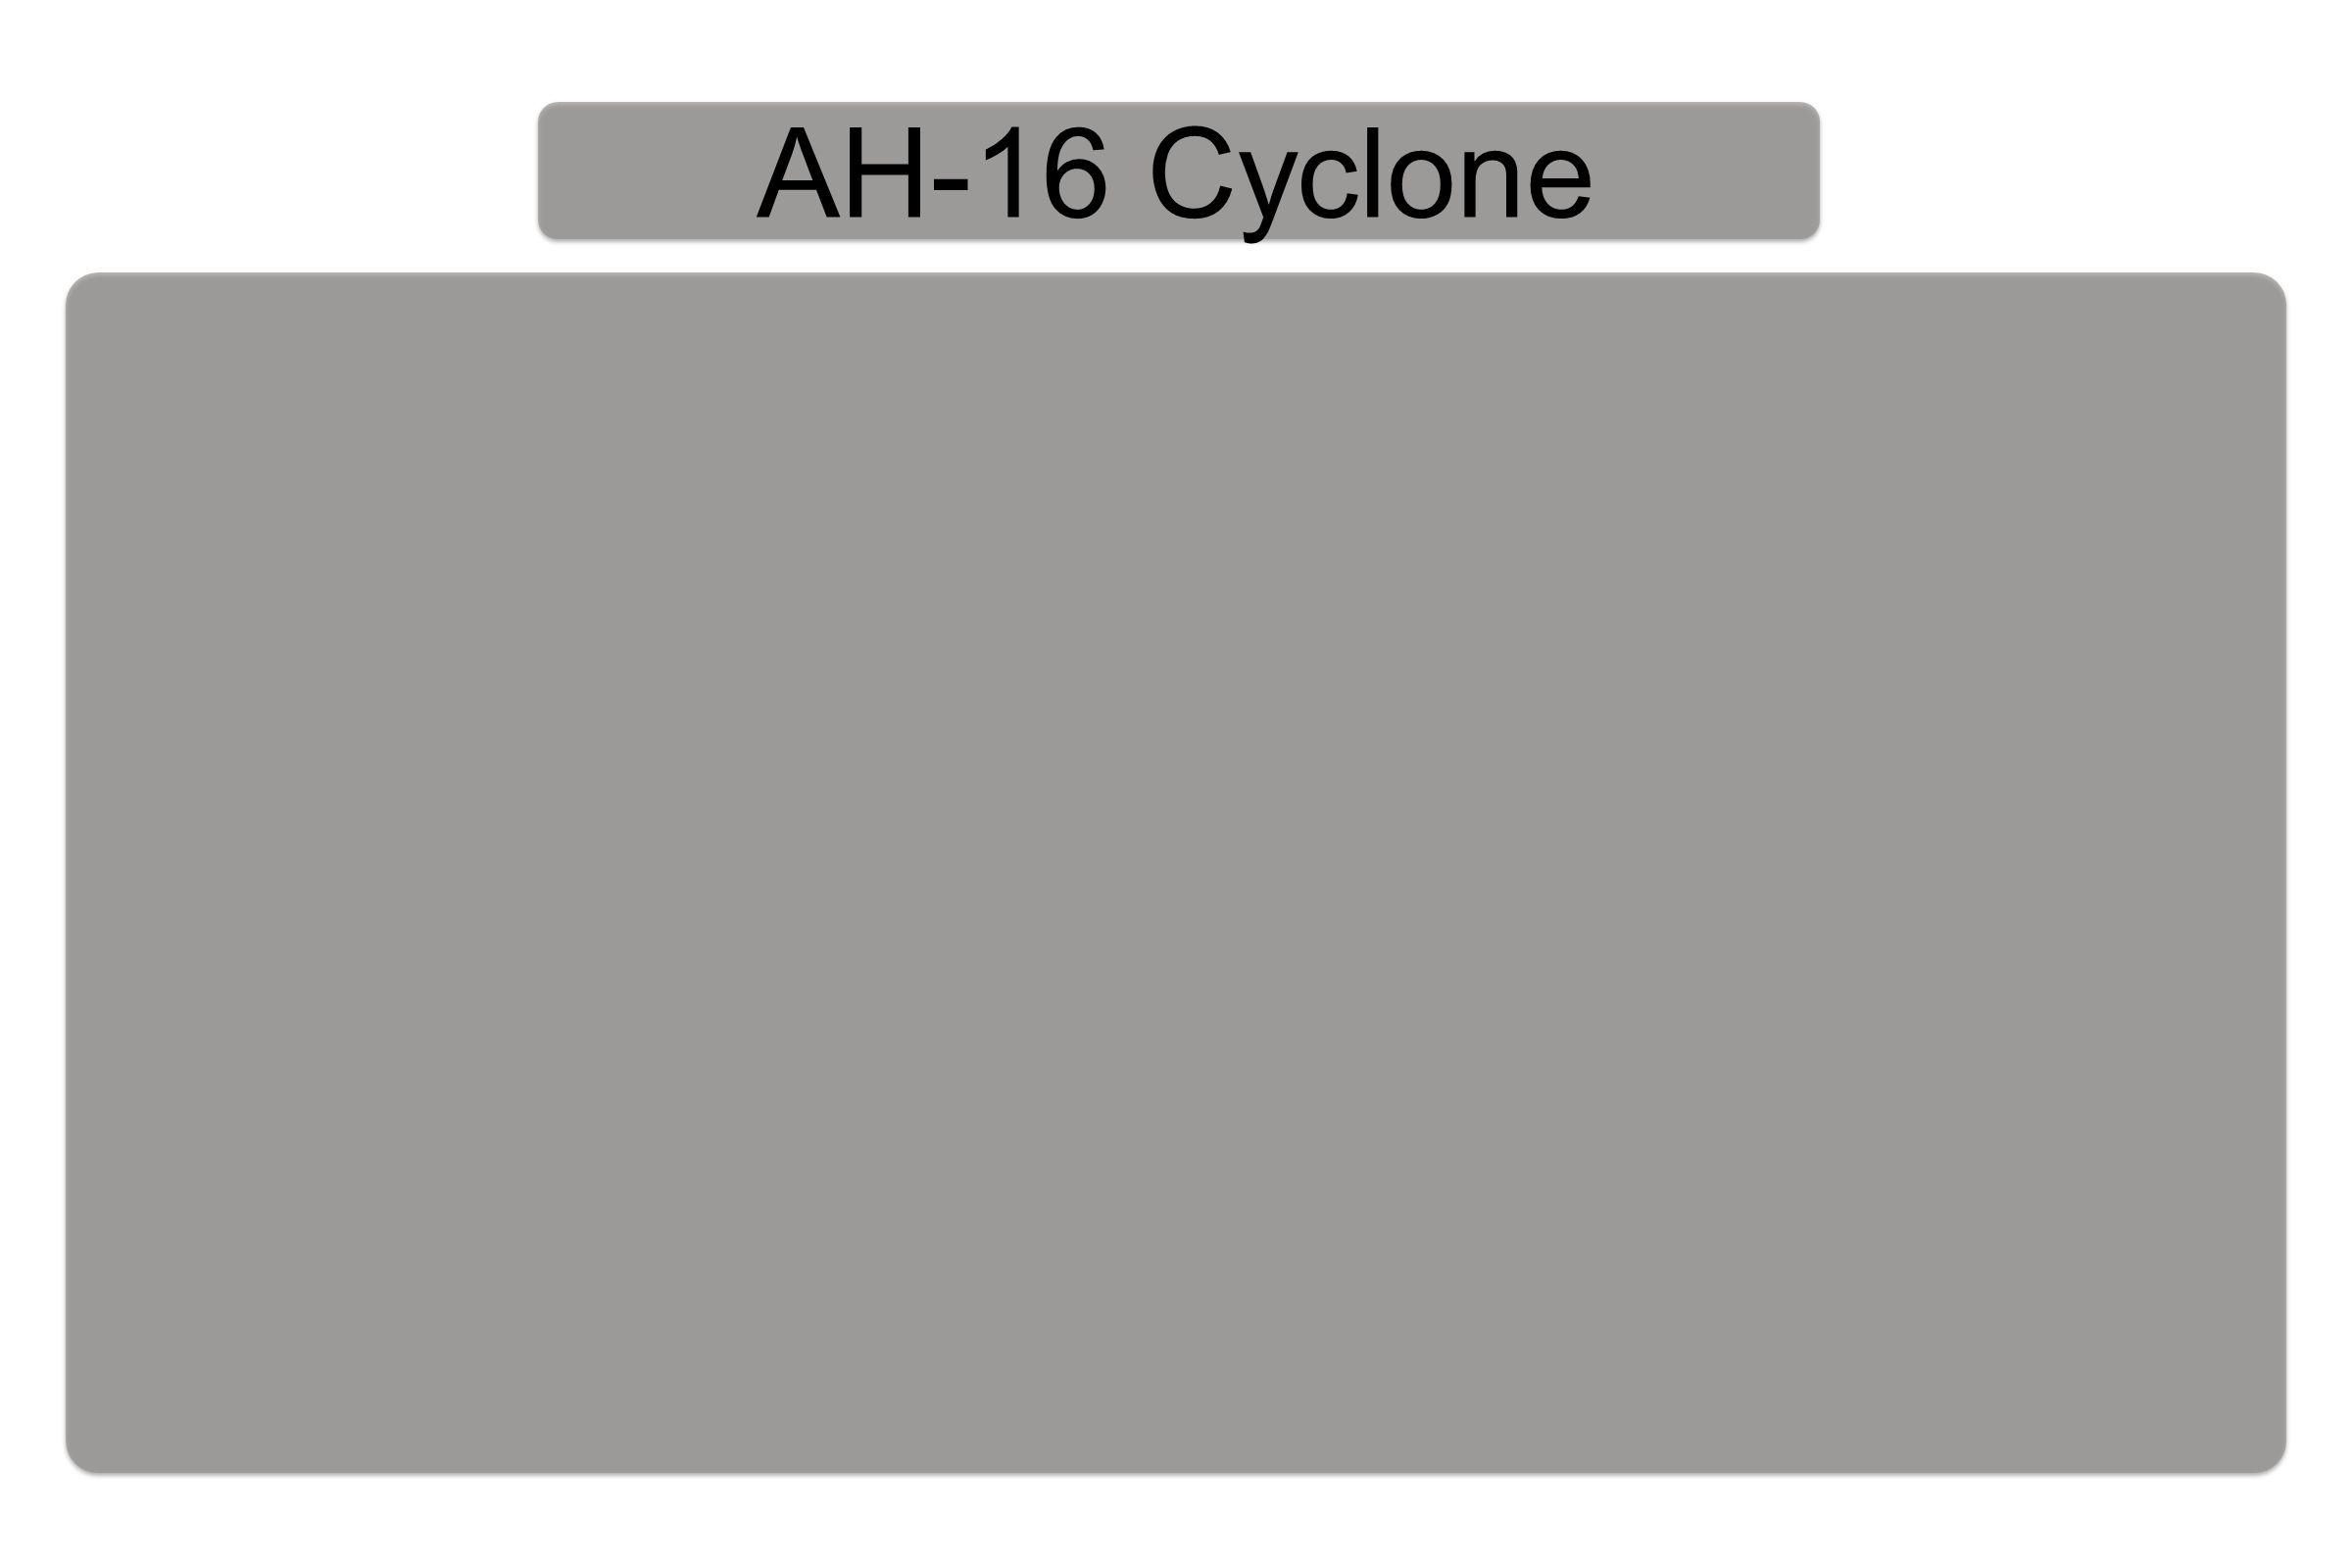 AH-16 Cyclone